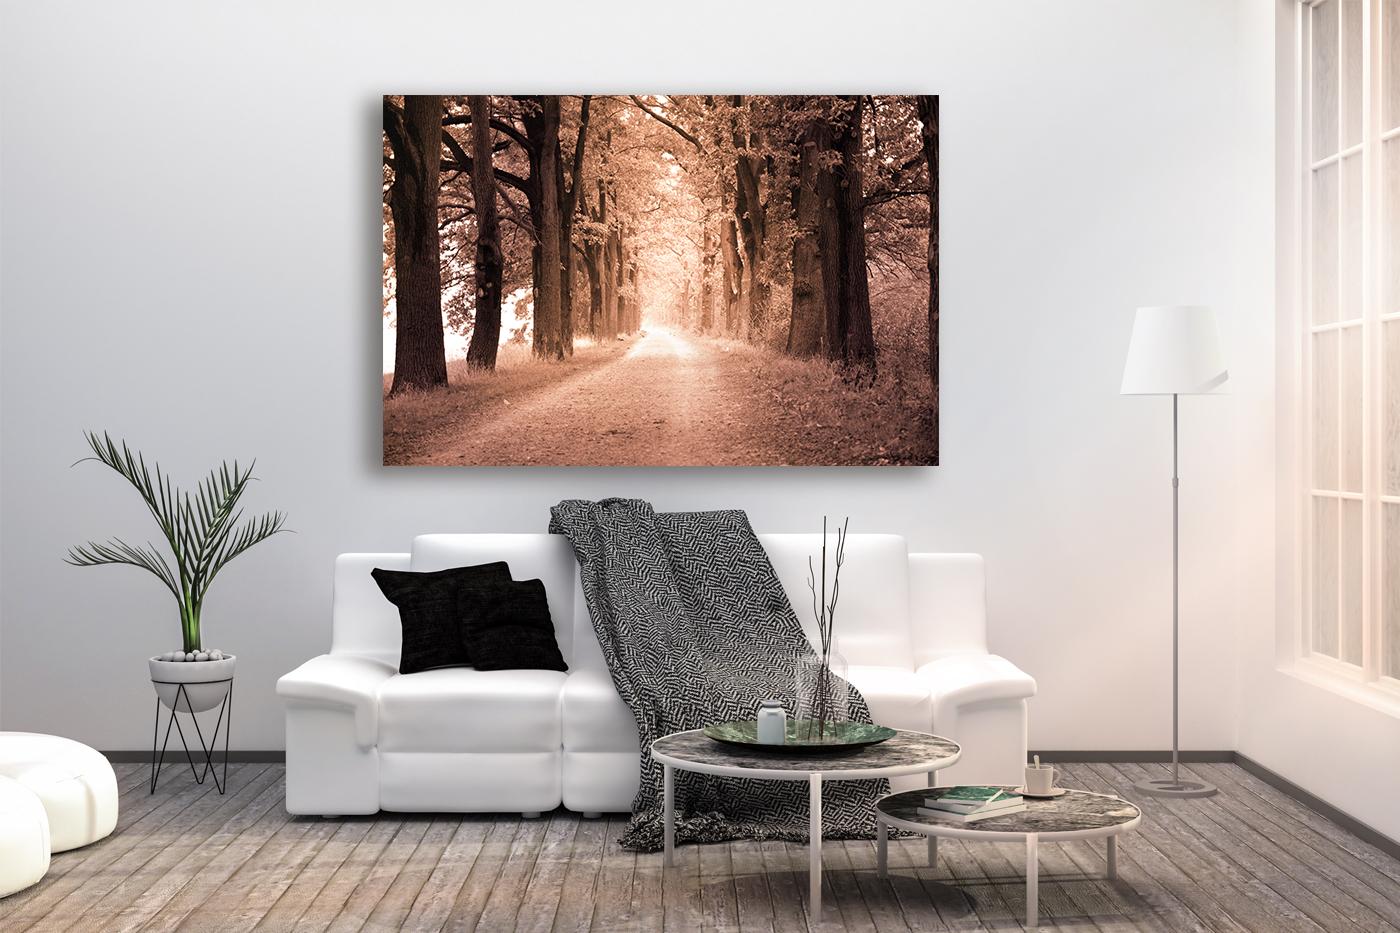 Nature photo, landscape photo, autumn alley photo, example image 2